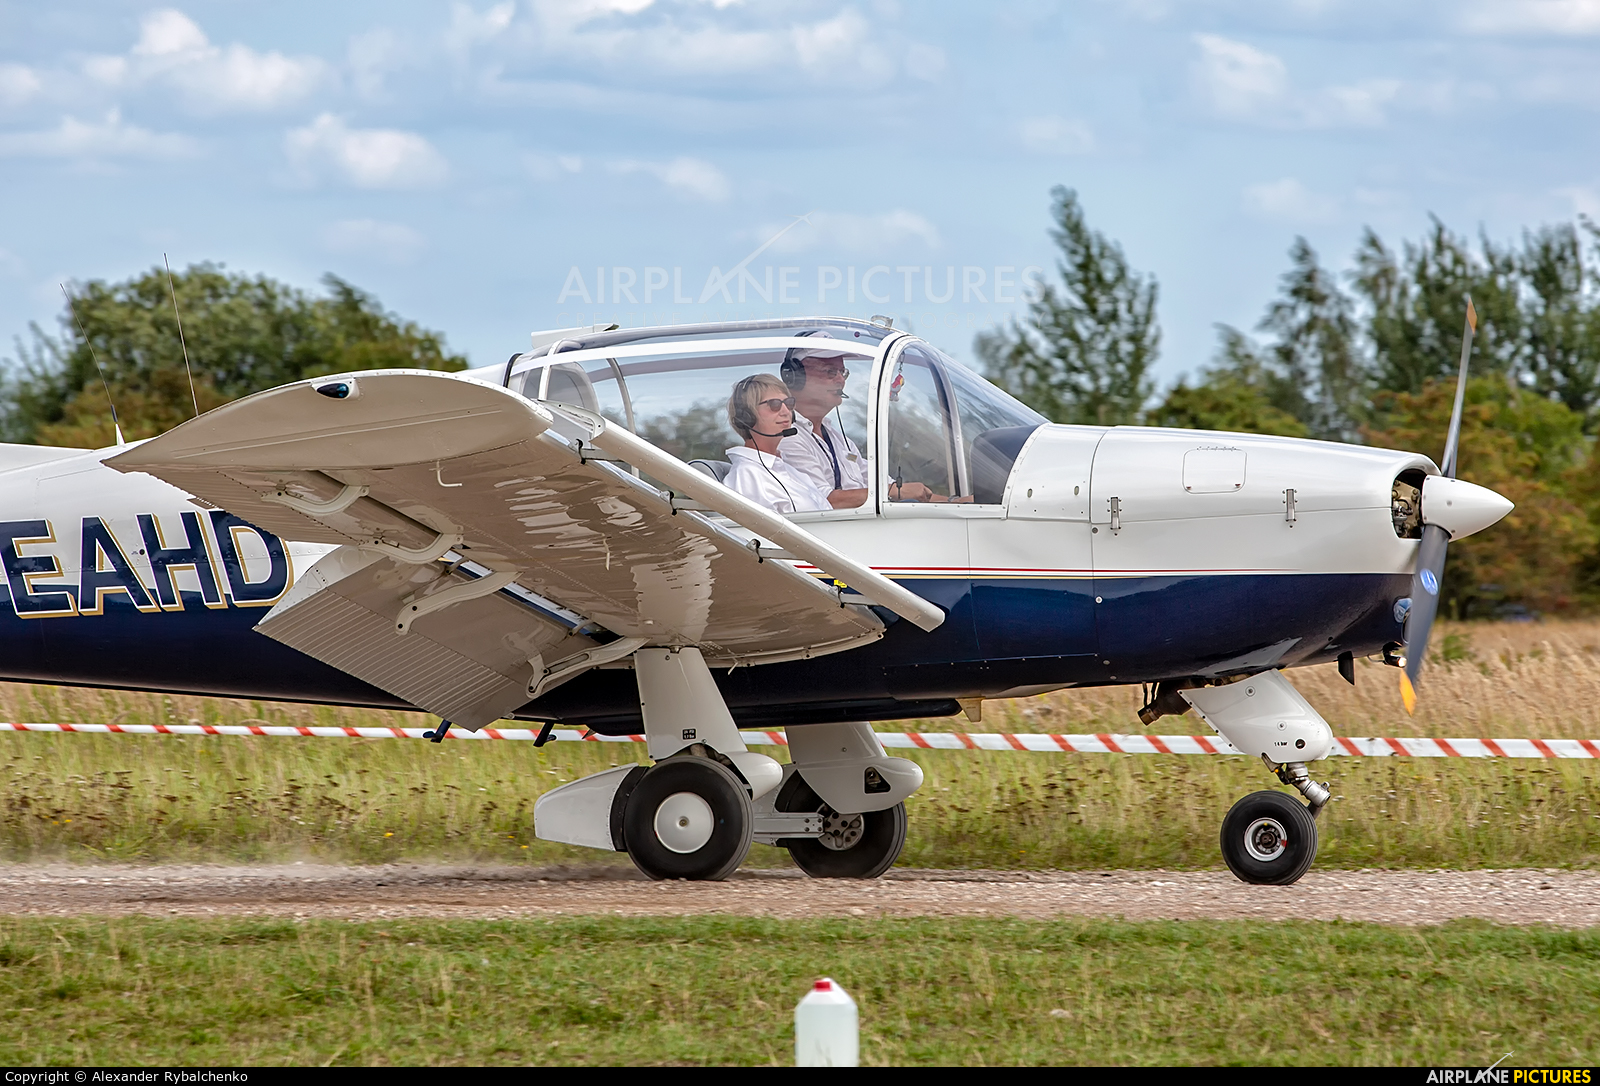 Private D-EAHD aircraft at Kaliningrad/Devau